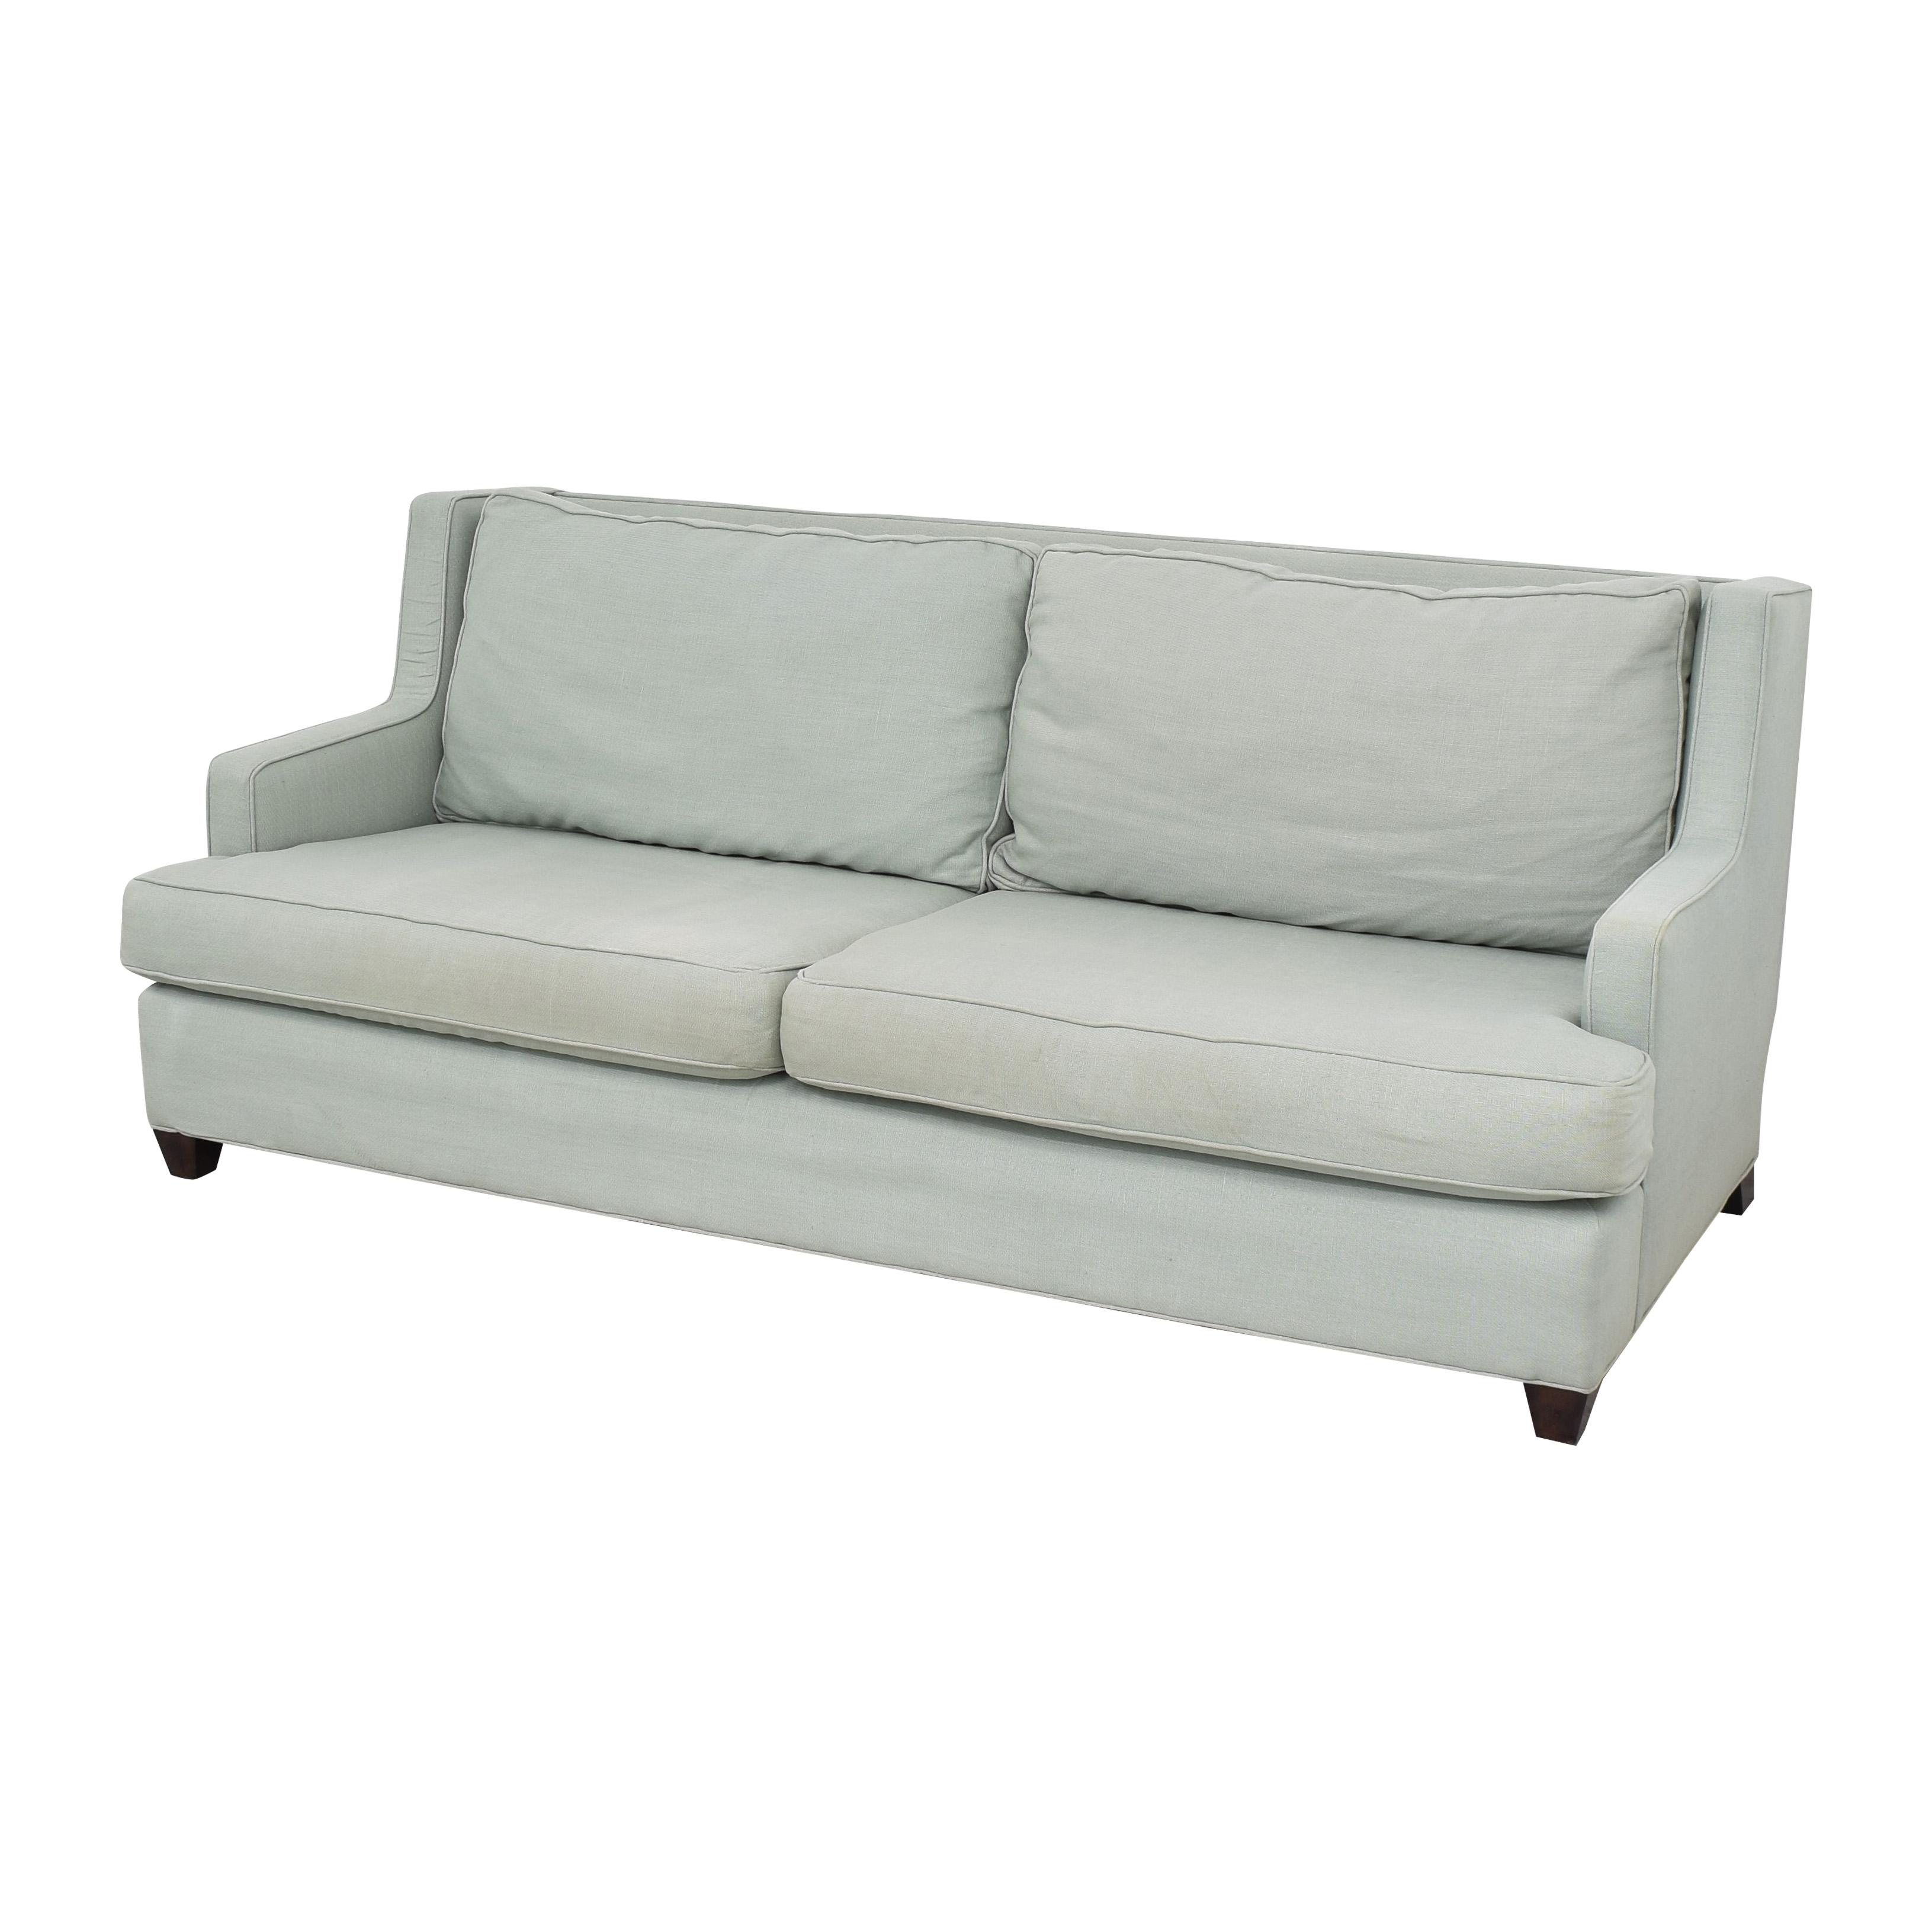 Mitchell Gold + Bob Williams Mitchell Gold + Bob Williams Two Cushion Sofa Sofas